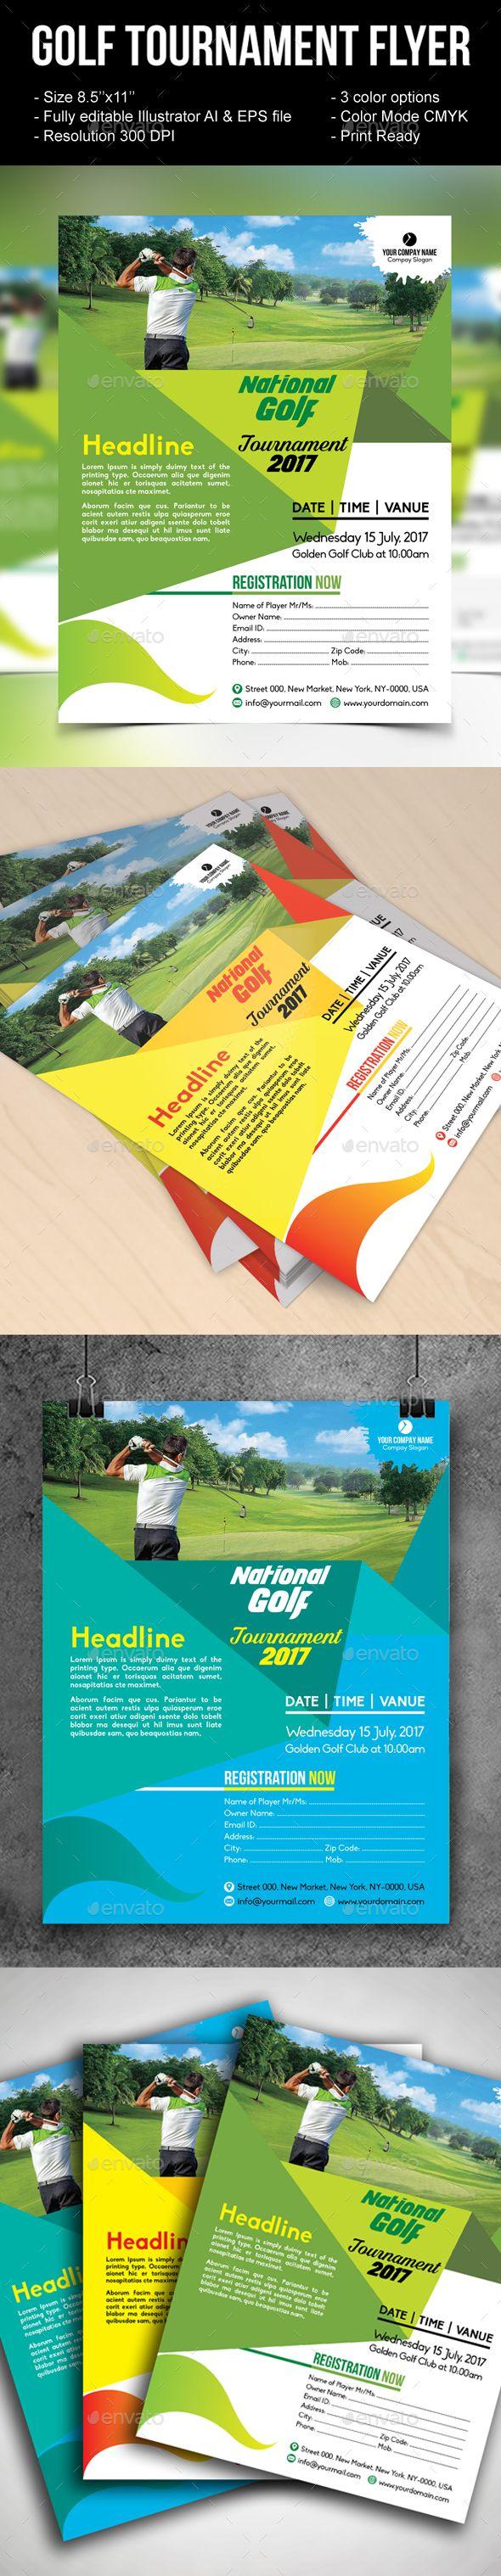 golf tournament flyer eps template cup elegant download